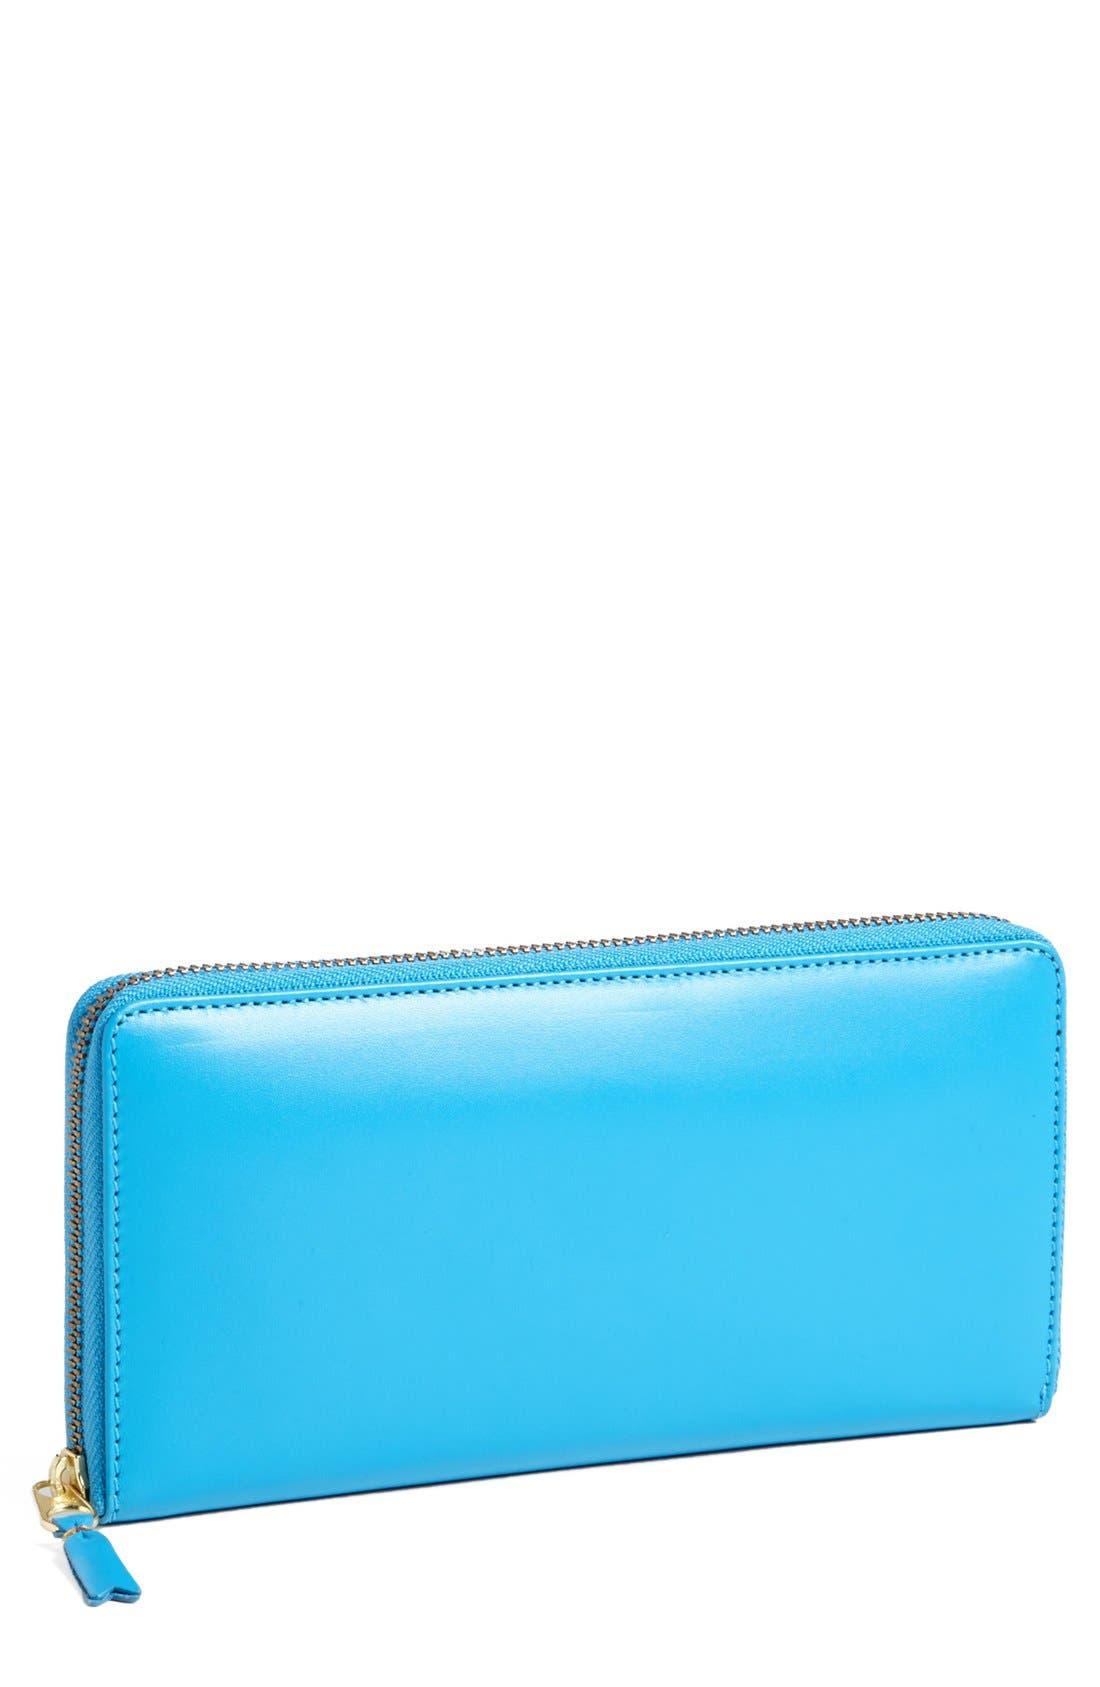 Continental Long Wallet,                         Main,                         color, Blue